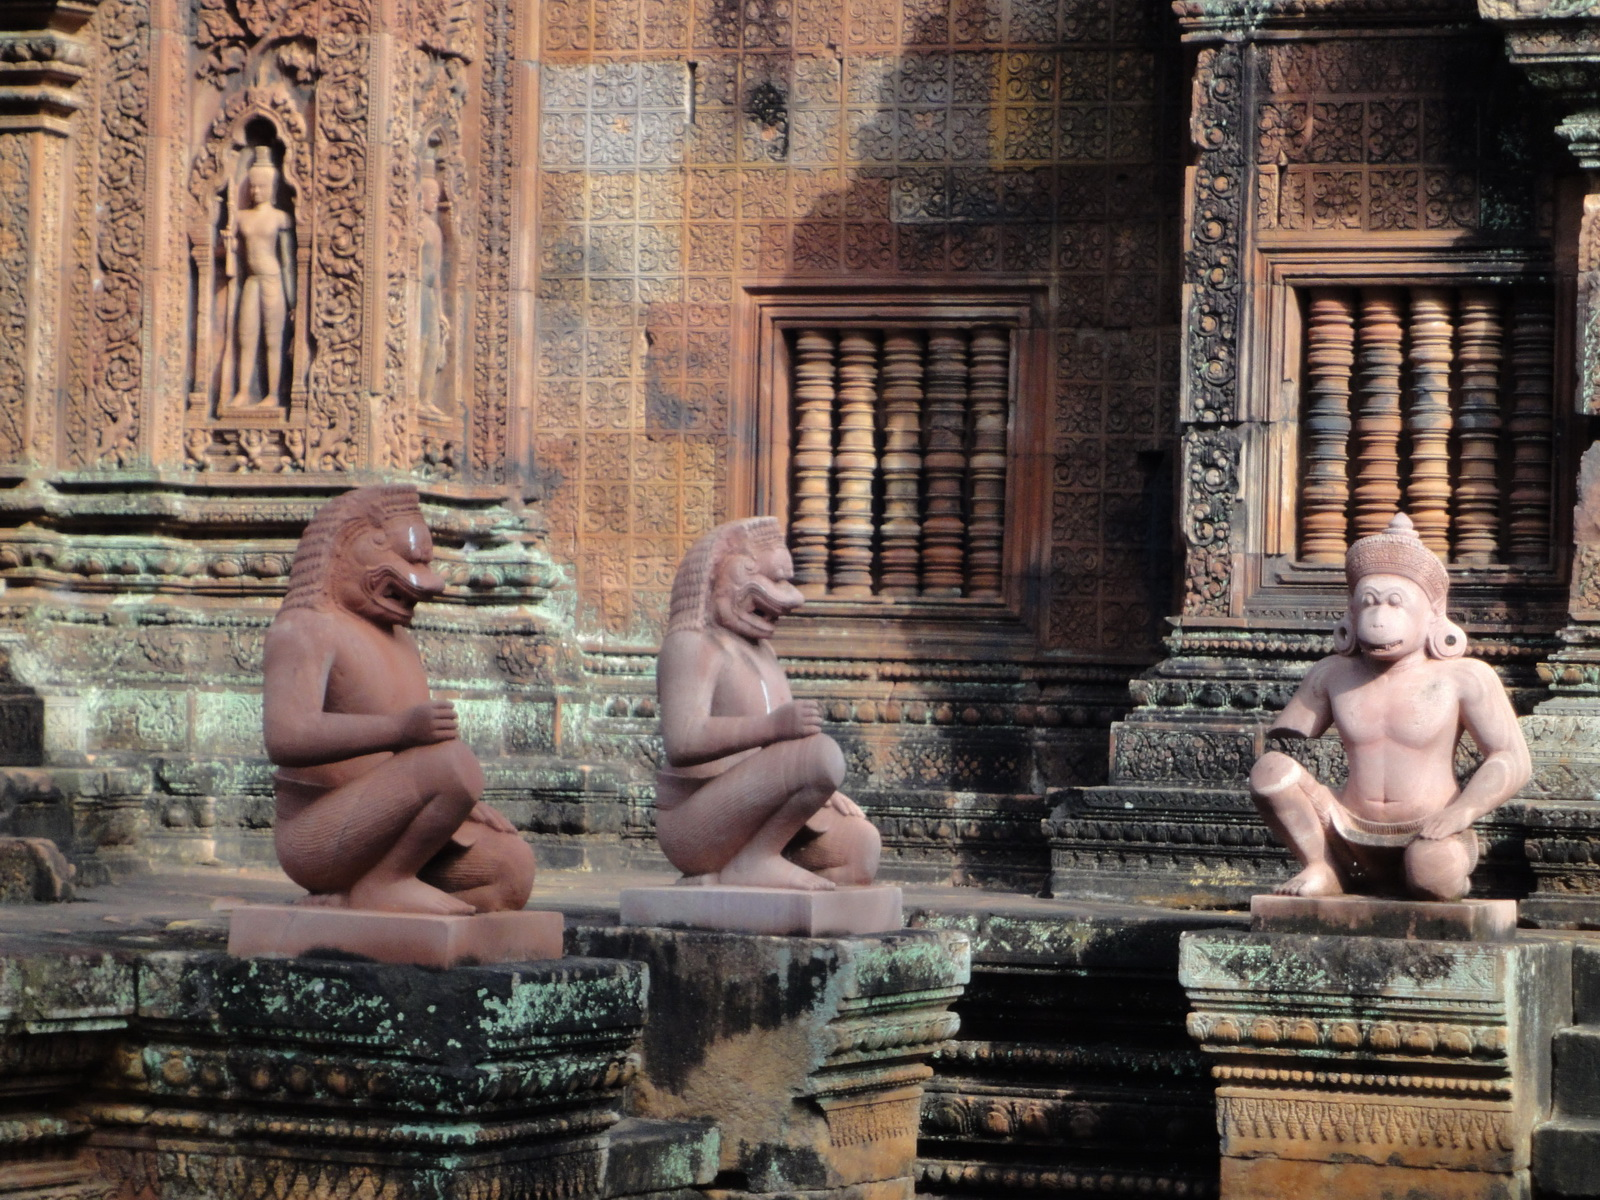 Banteay Srei 10th century architecture inner sanctuary area 05